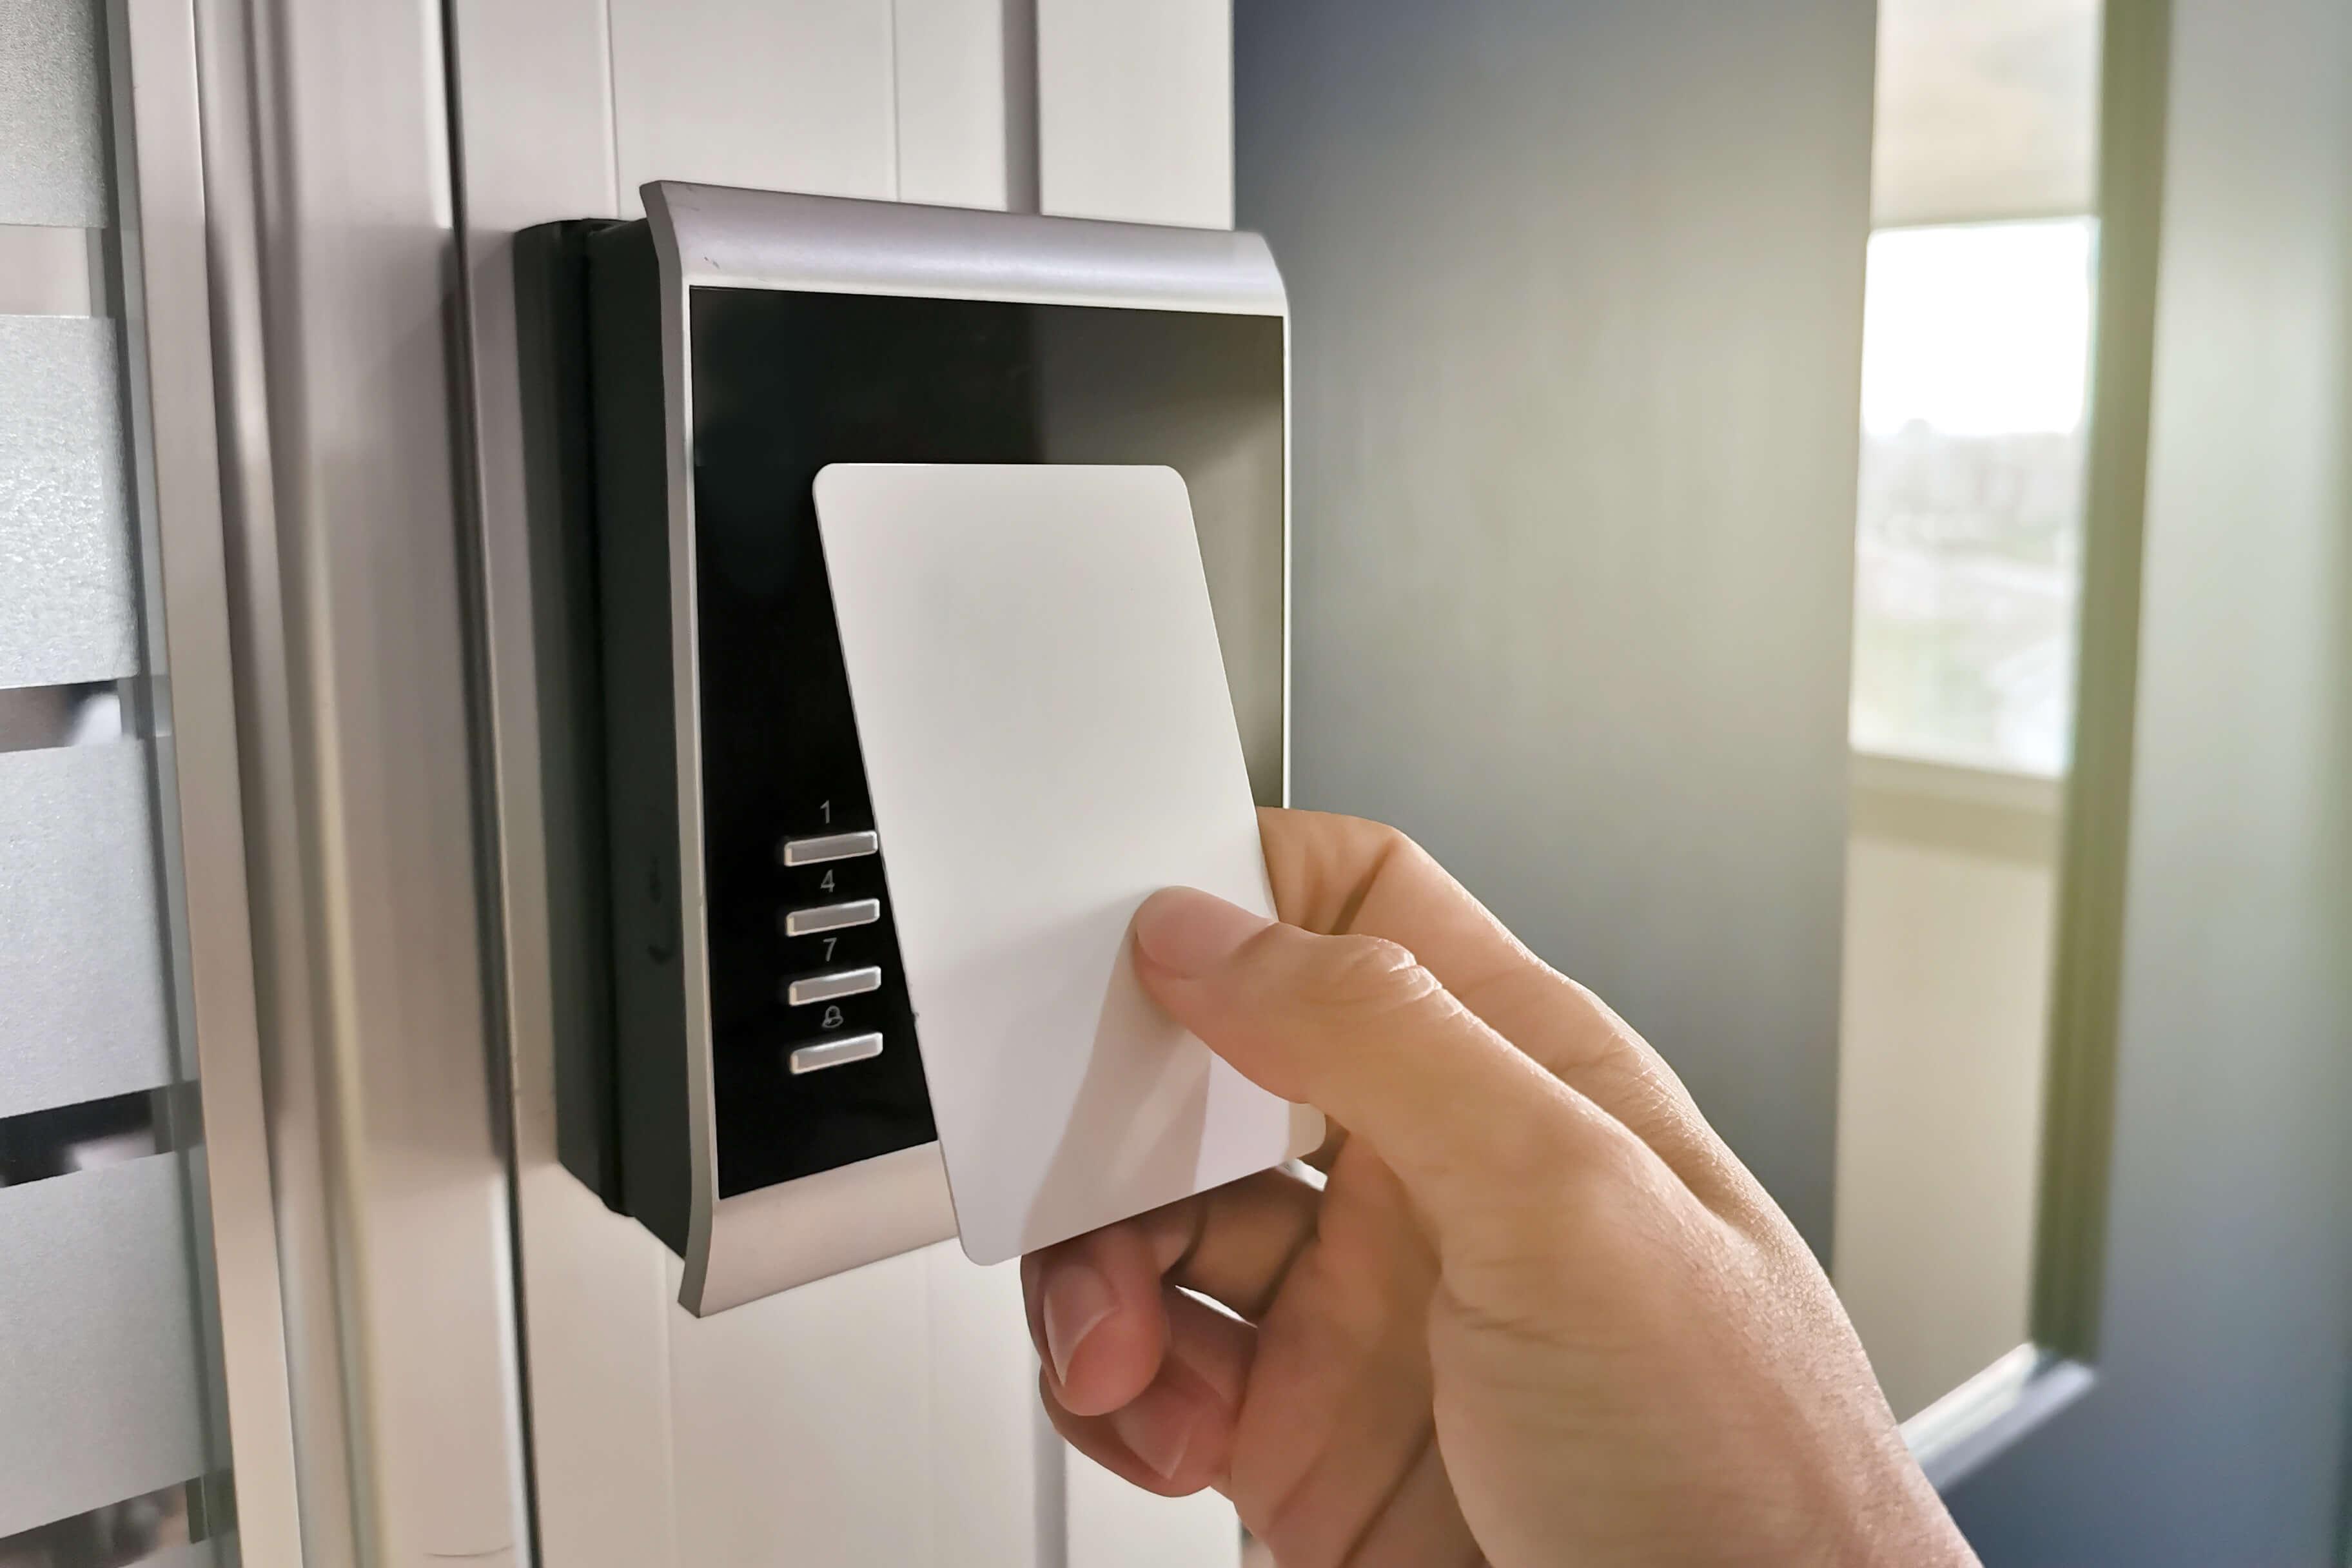 Access Control Card Technology